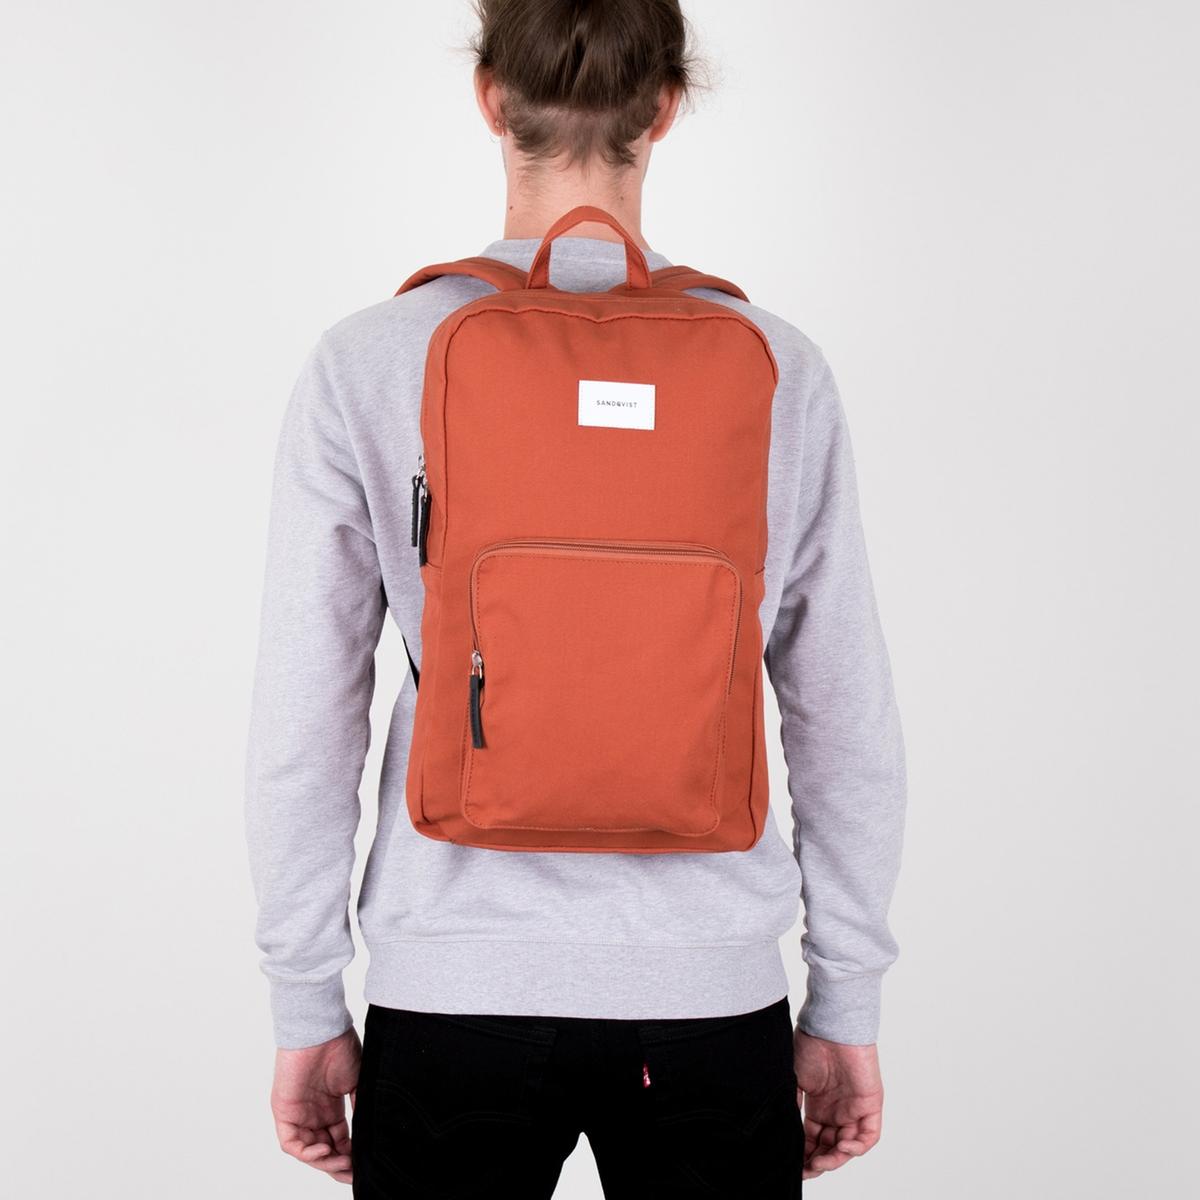 все цены на Рюкзак для ноутбука на молнии 15 дюймов KIM